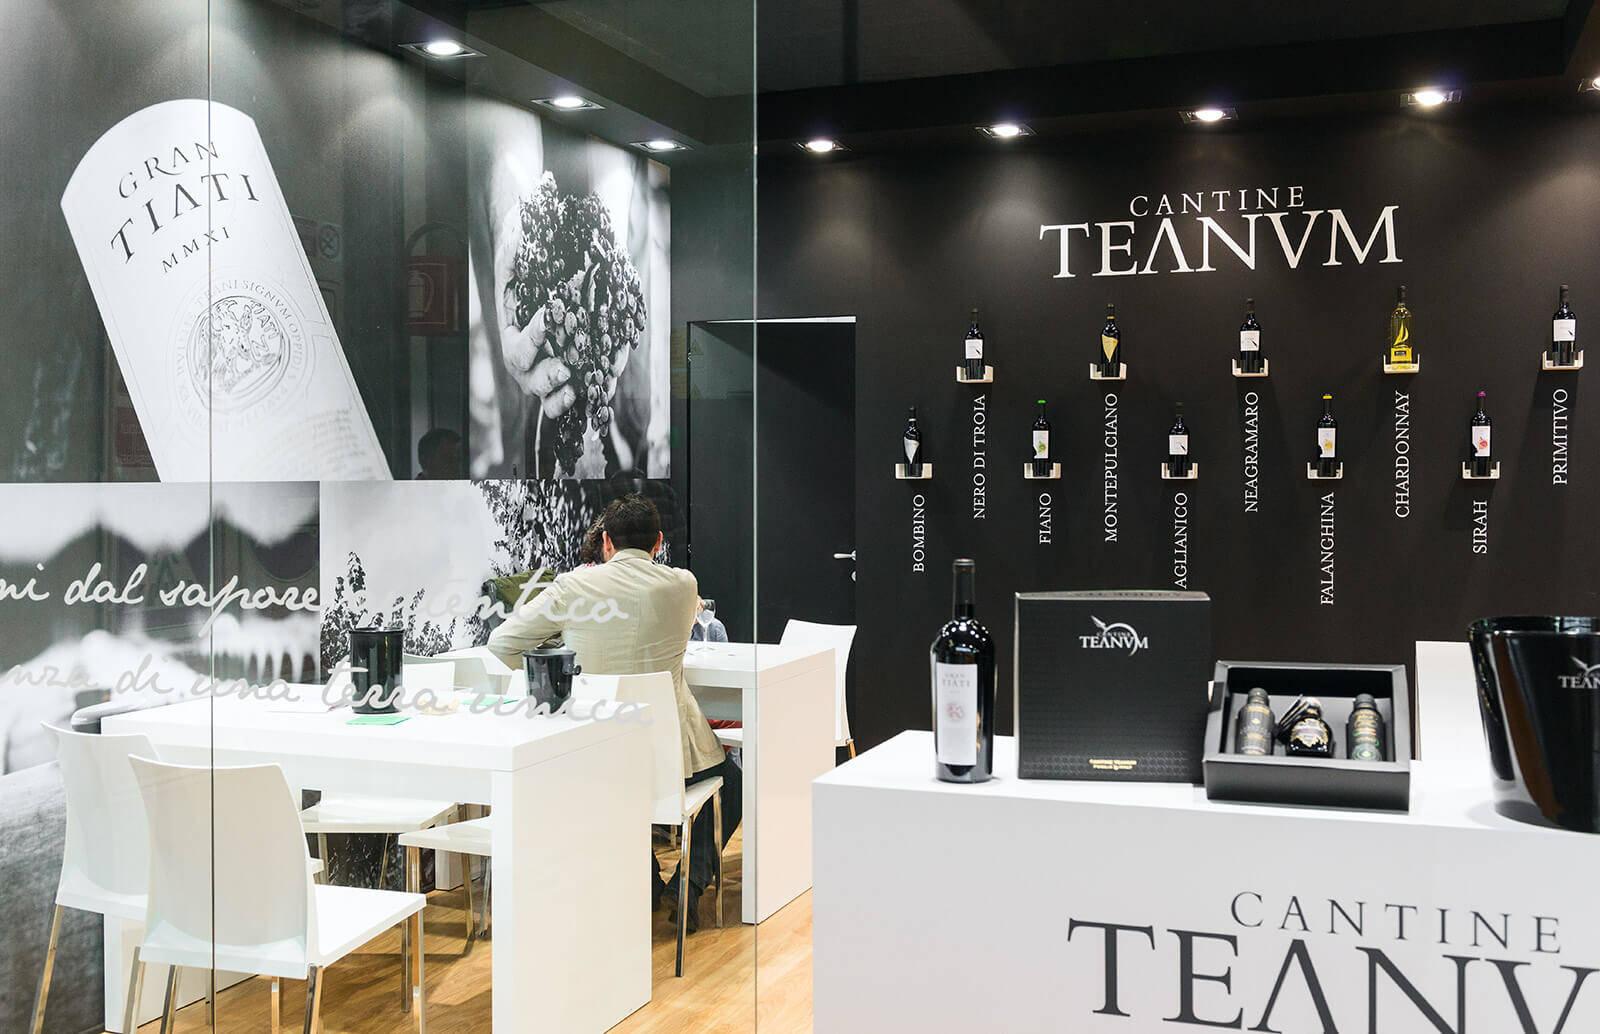 Cantine Teanum al TuttoFood Milano